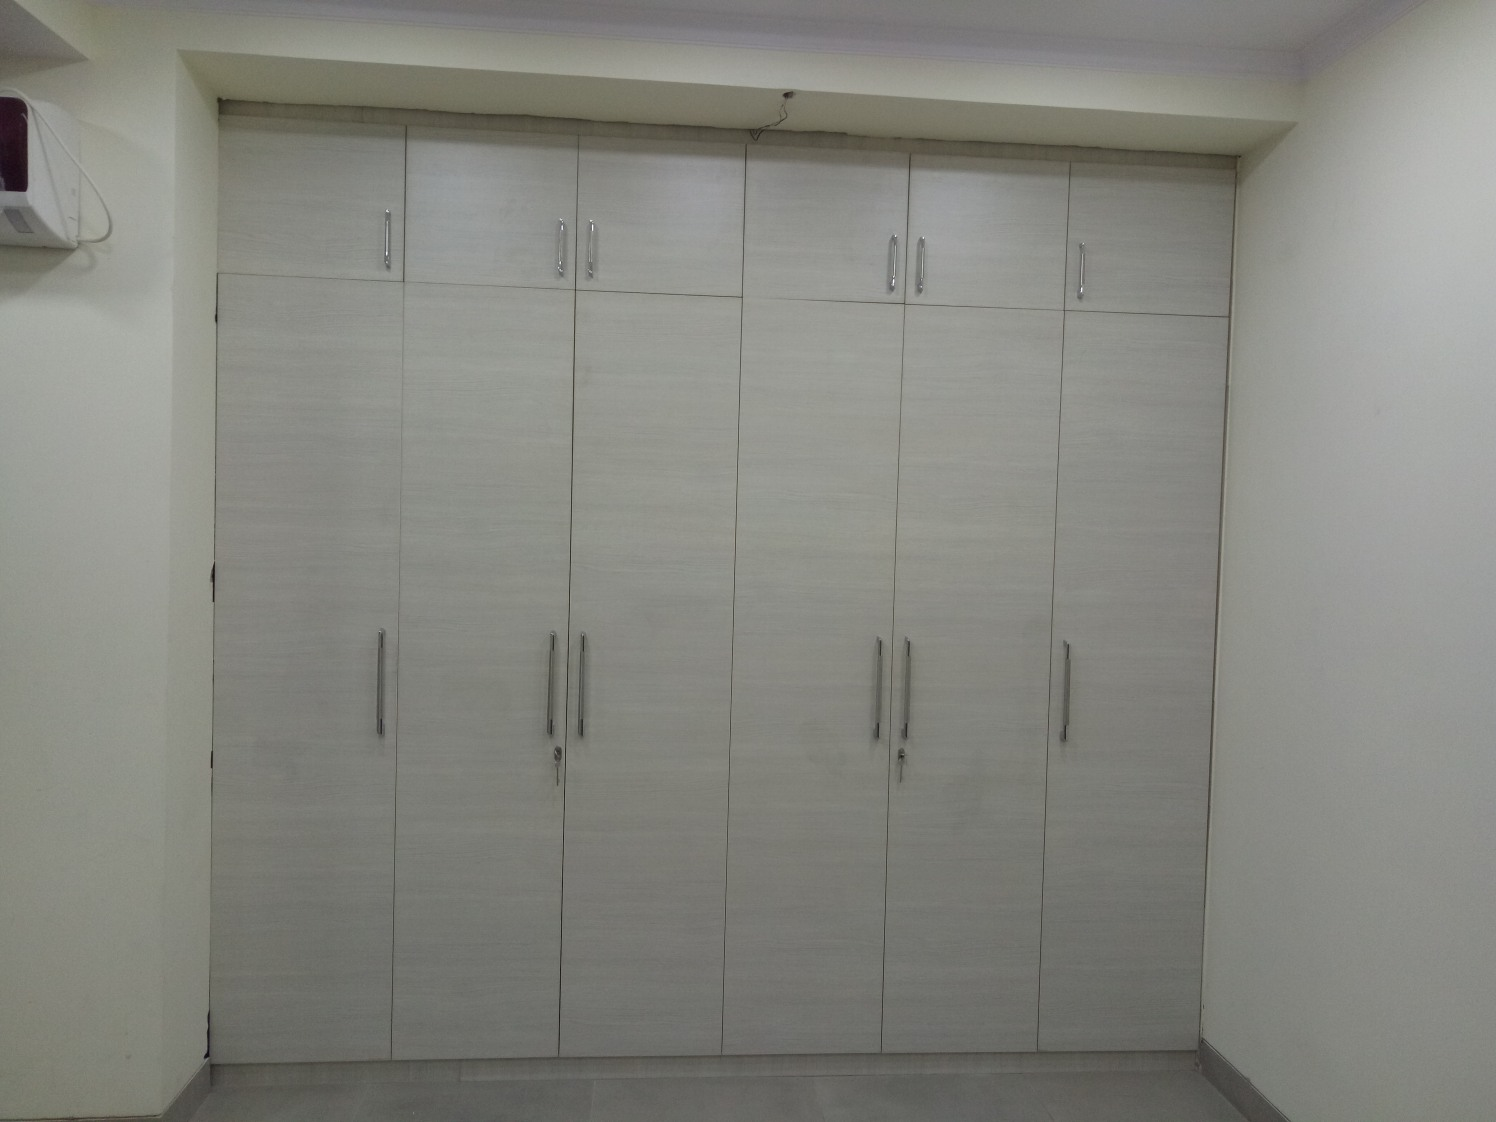 Full Wall Wardrobe For Bedroom by Amit Sharma  Bedroom Contemporary   Interior Design Photos & Ideas